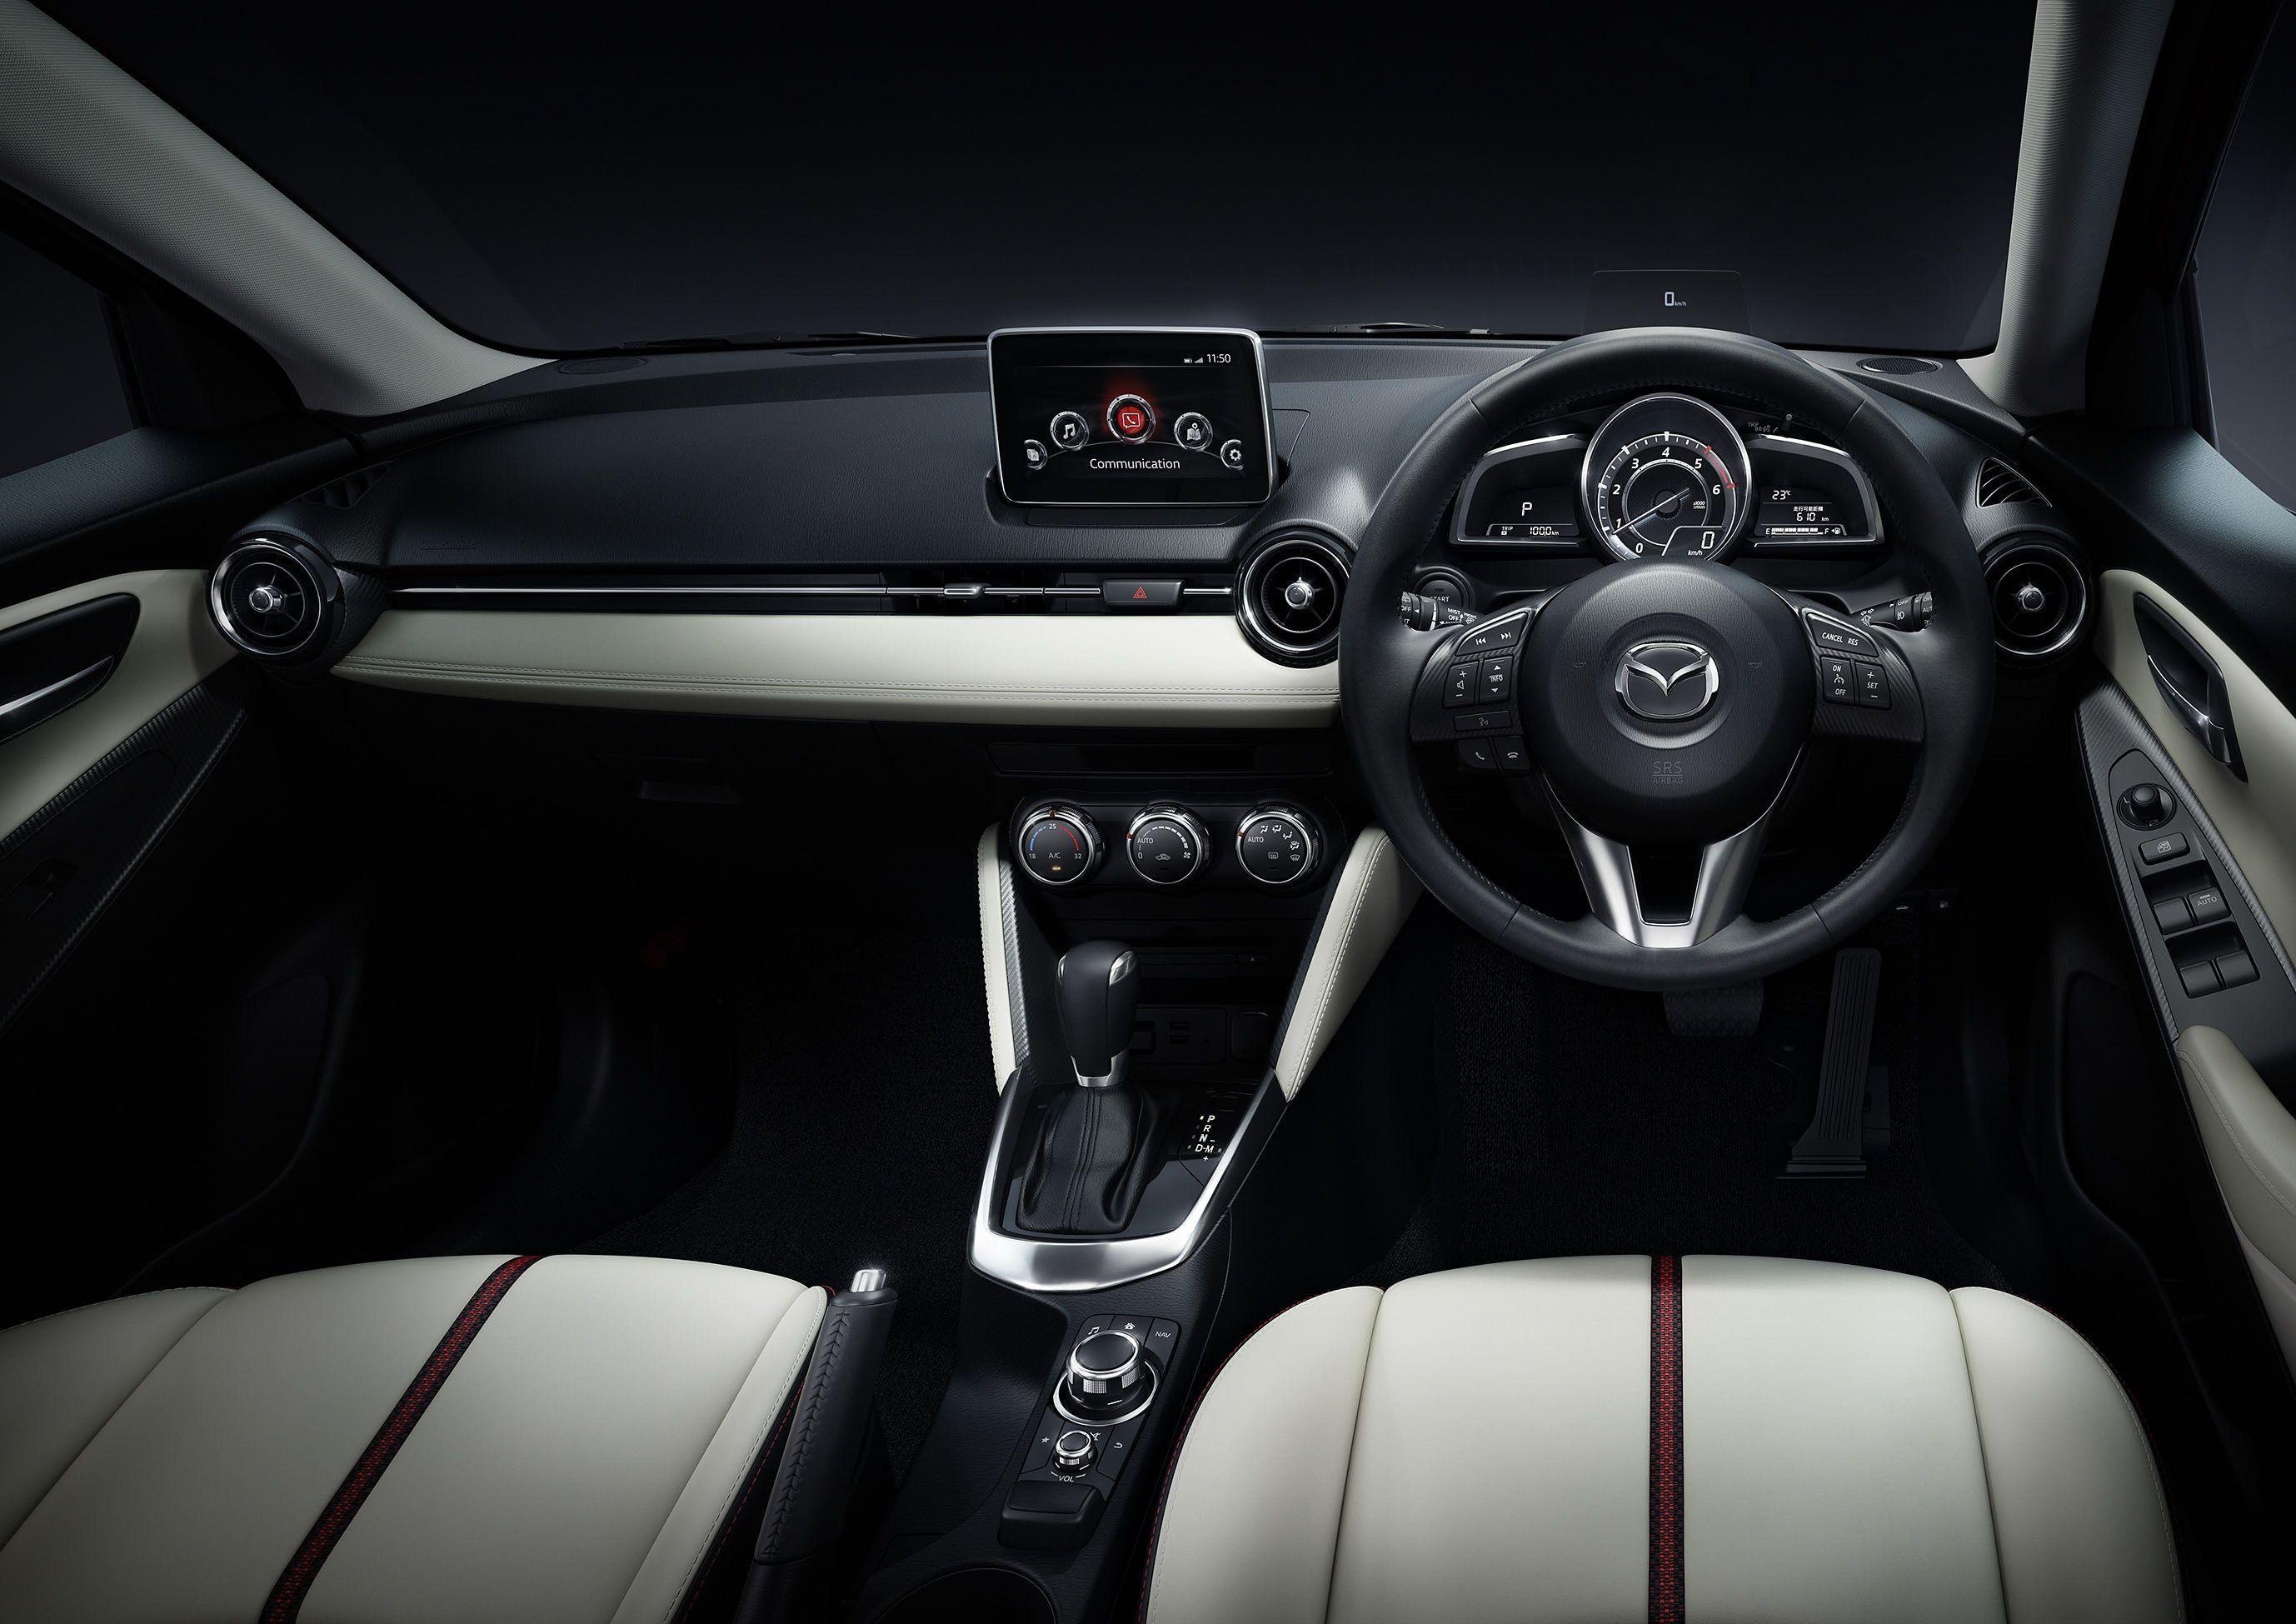 Kelebihan Kekurangan Mazda 2 2015 Murah Berkualitas